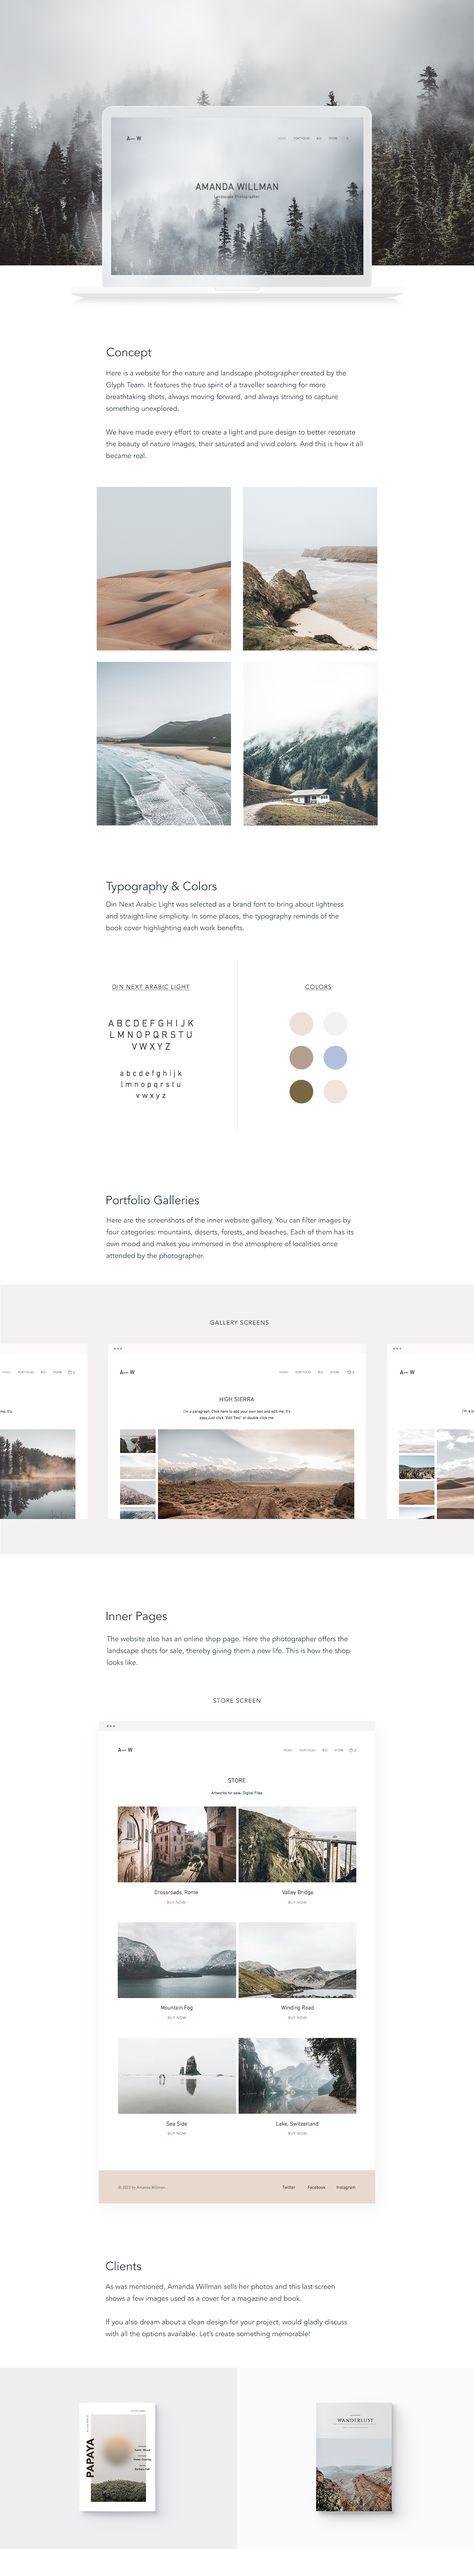 Photographer-web-design-inspiration-ui-ux-interfaces-branding-glyph-studio-agency-gallery-portfolio